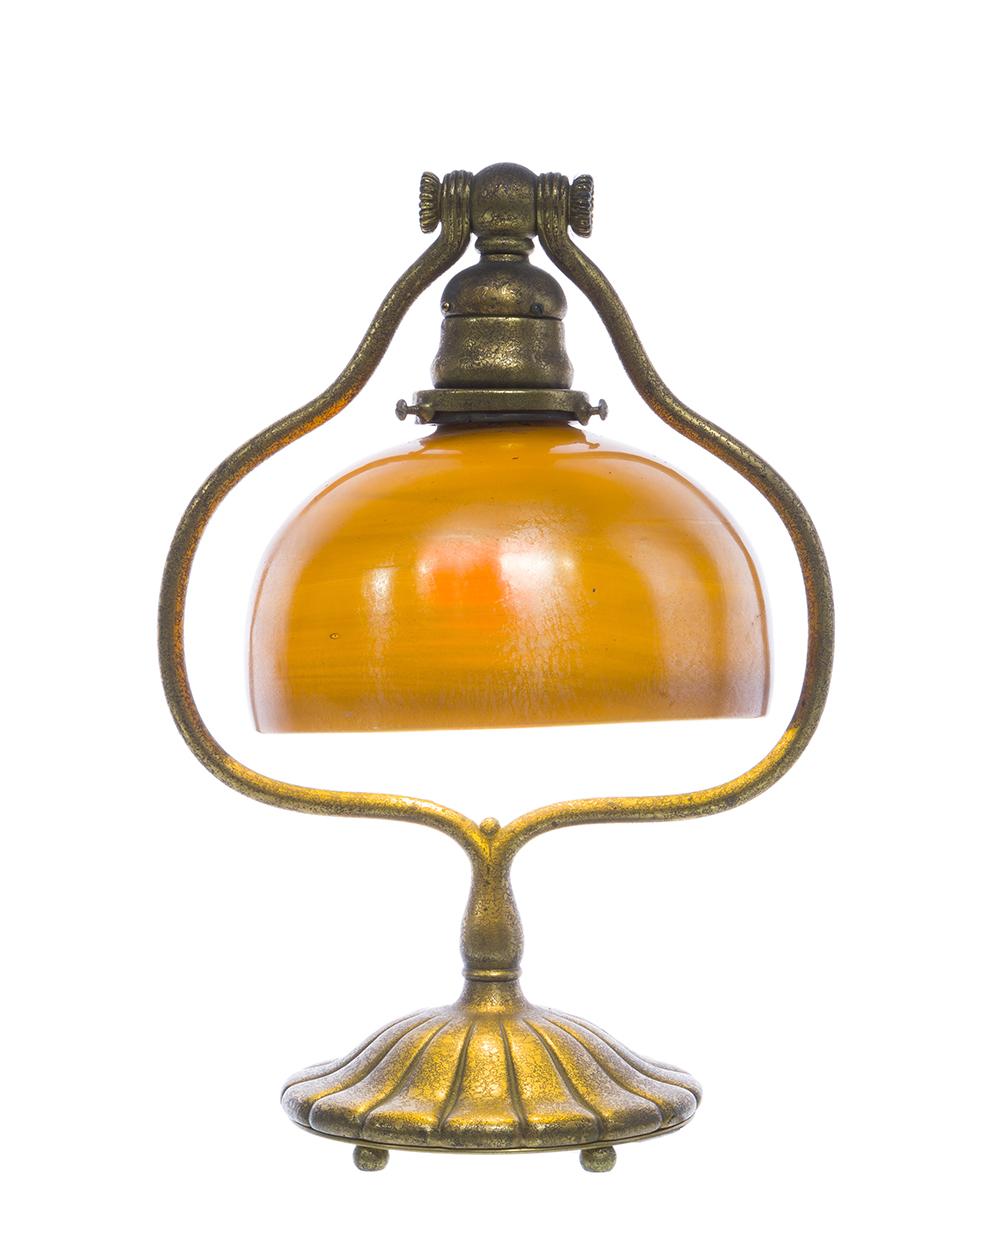 Lot 14 - A Tiffany Studios harp desk lamp with Favrile shade